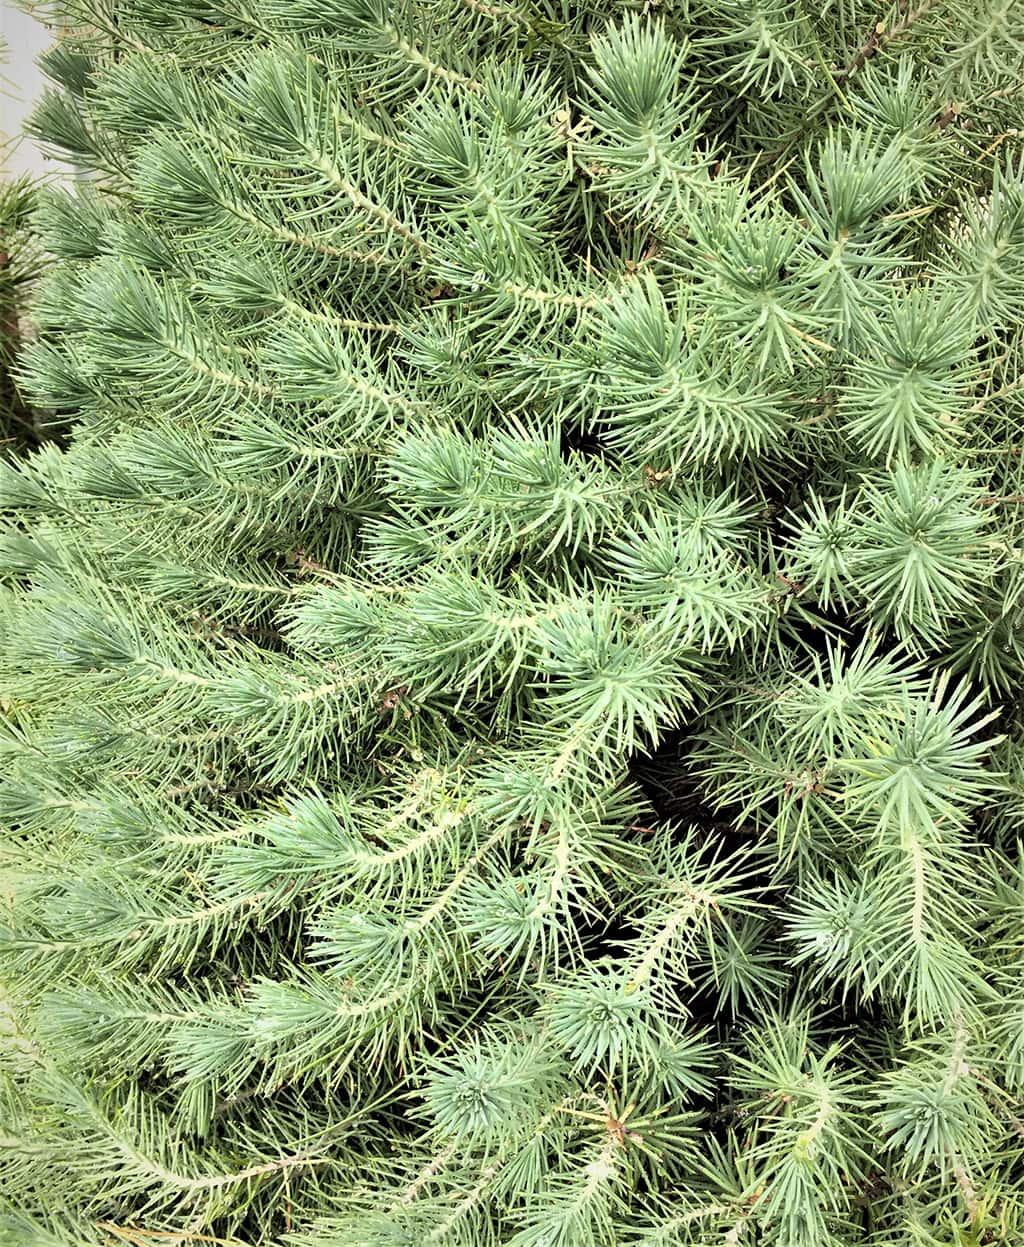 Stone Pine Juvenile Foliage by David Gress